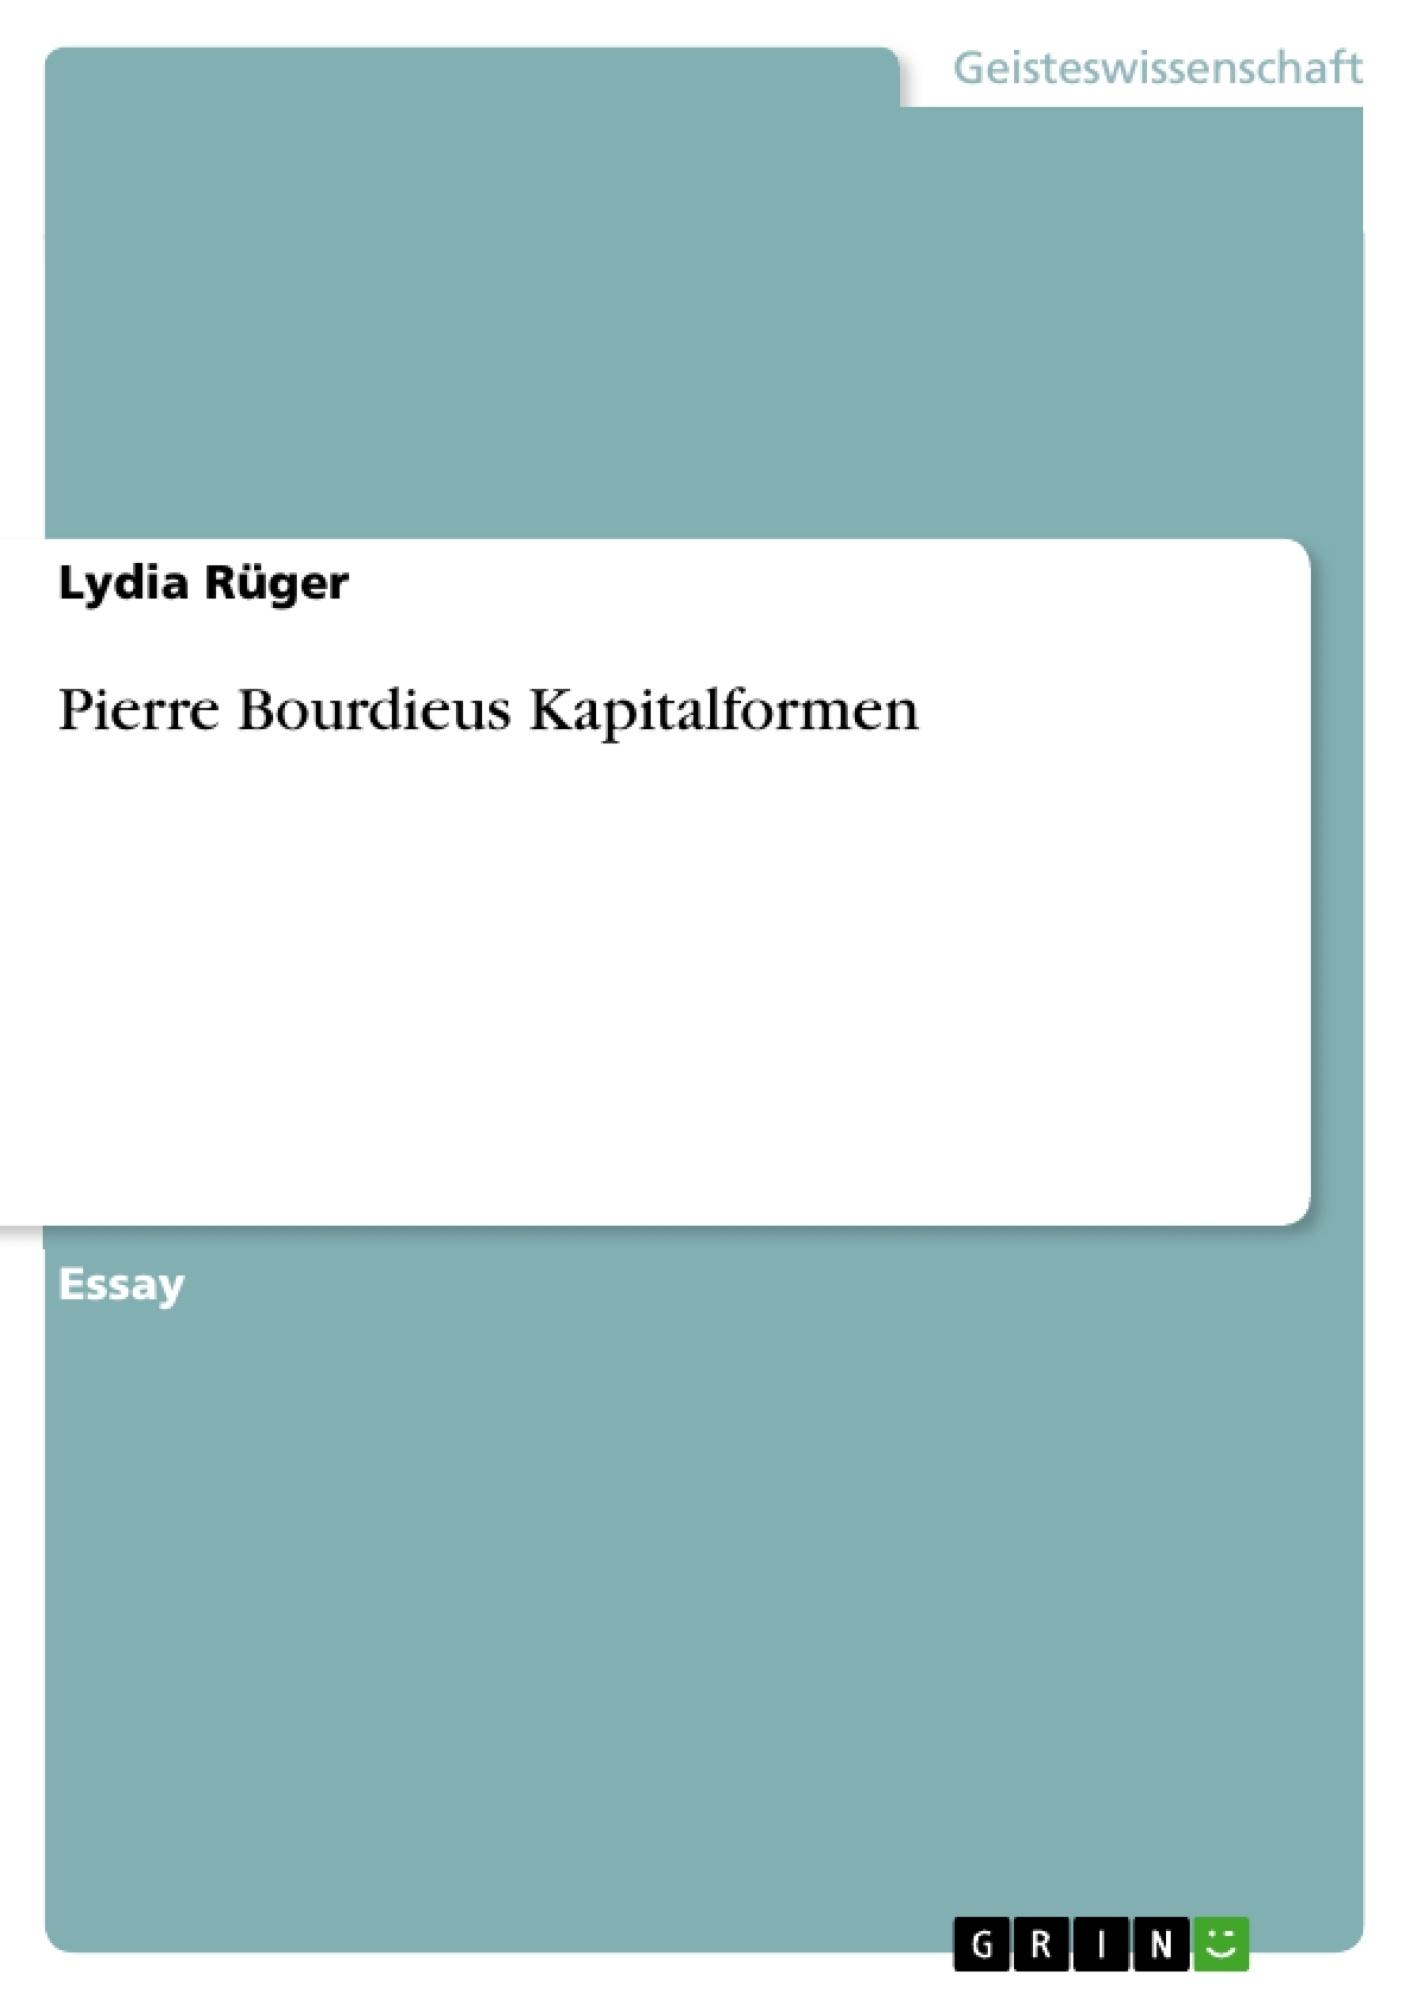 Titel: Pierre Bourdieus Kapitalformen